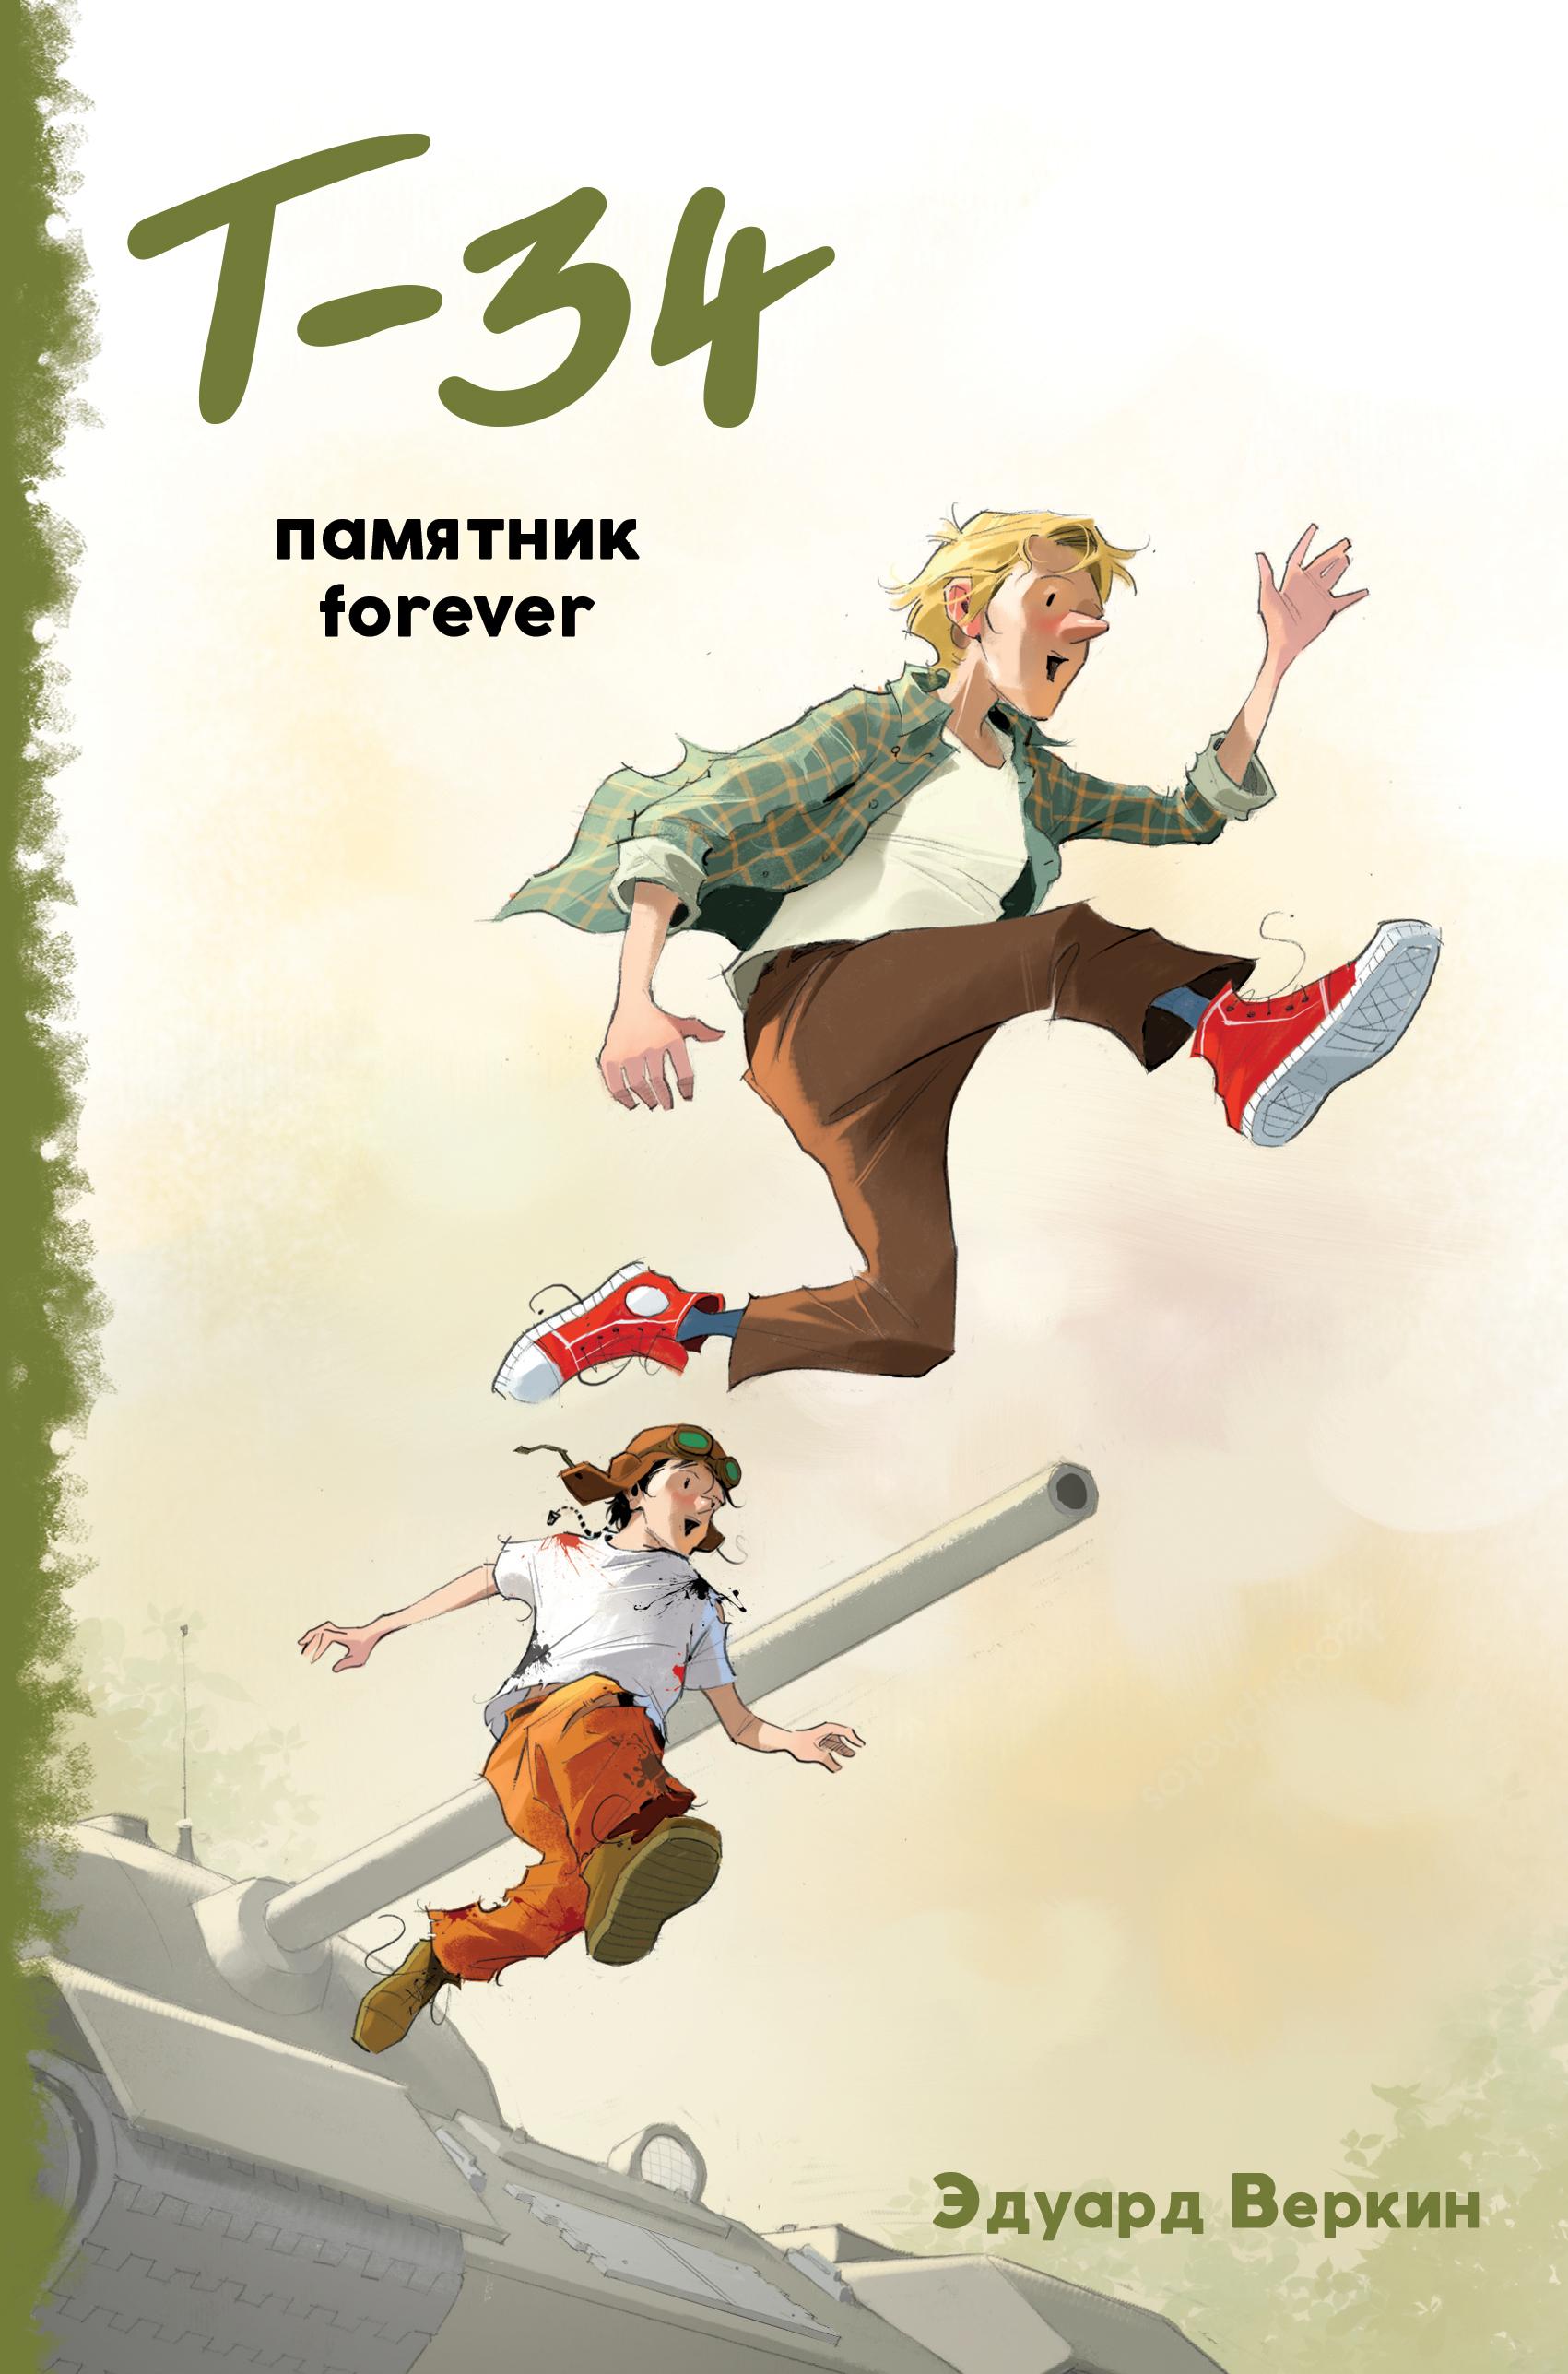 Эдуард Веркин «Т-34». Памятник forever веркин э пчела убийца гонки на мотоциклах